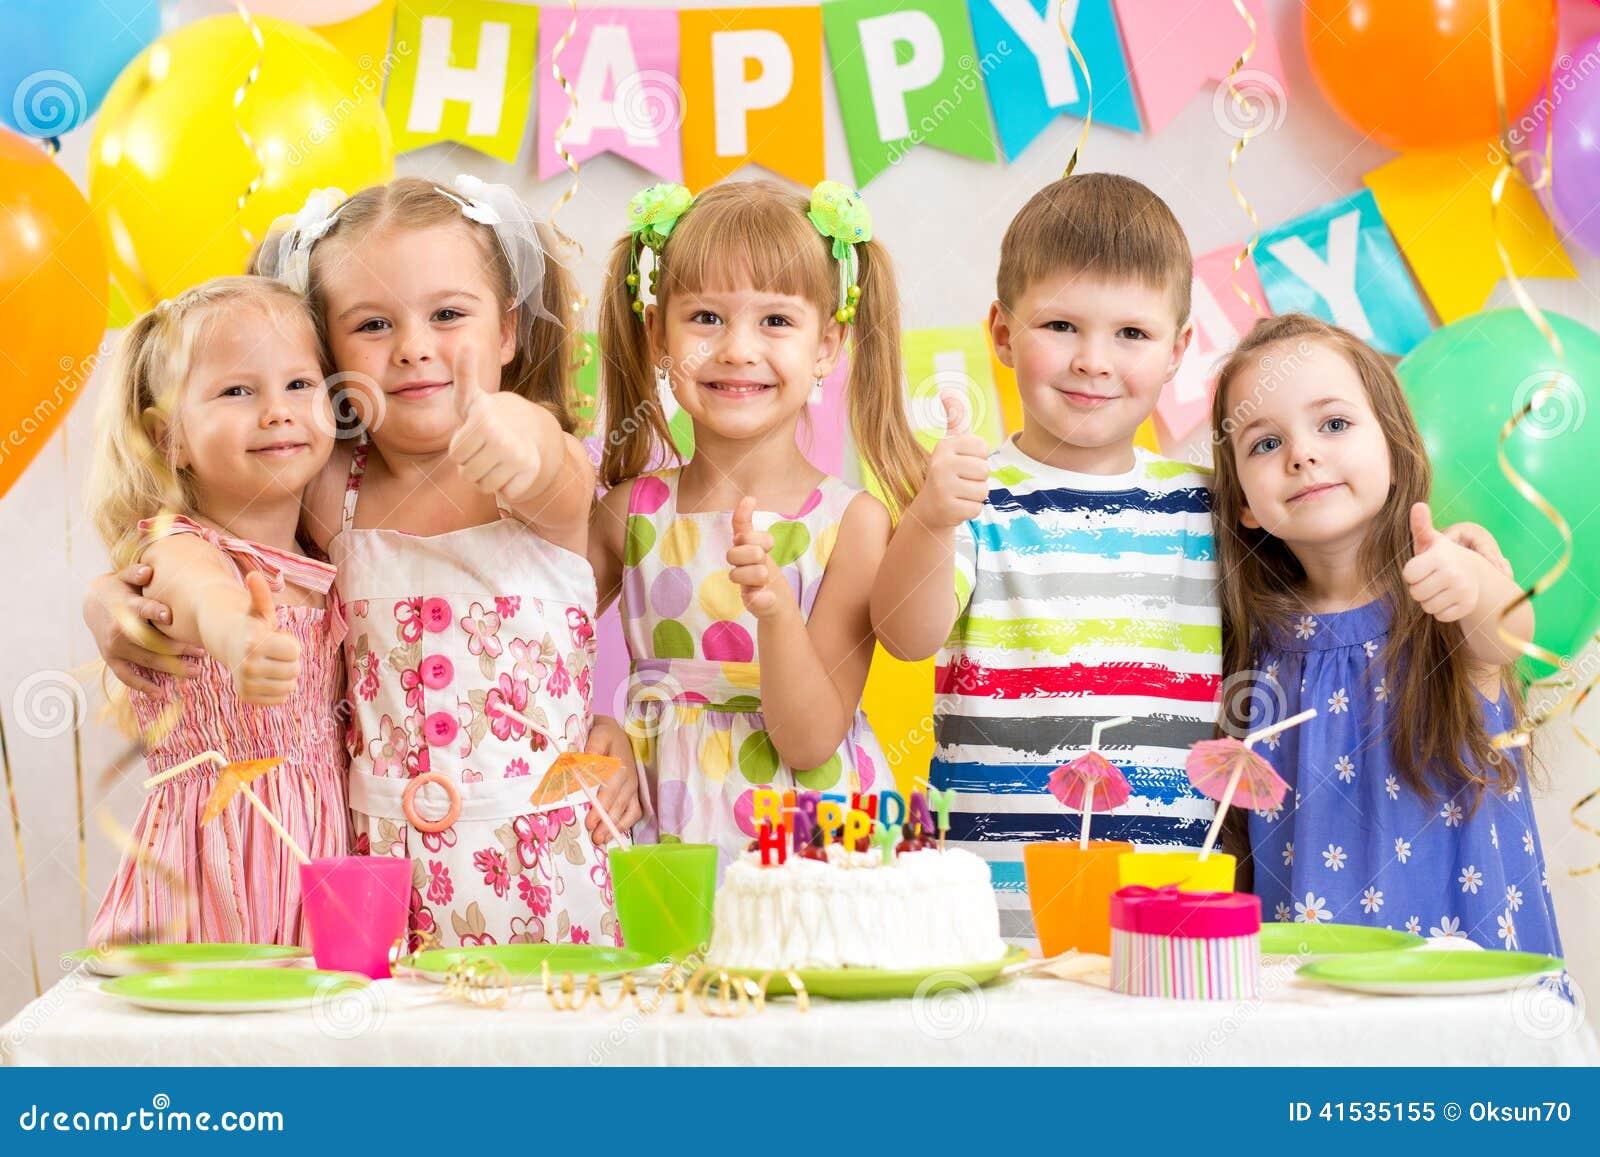 Kids preschoolers celebrate birthday party